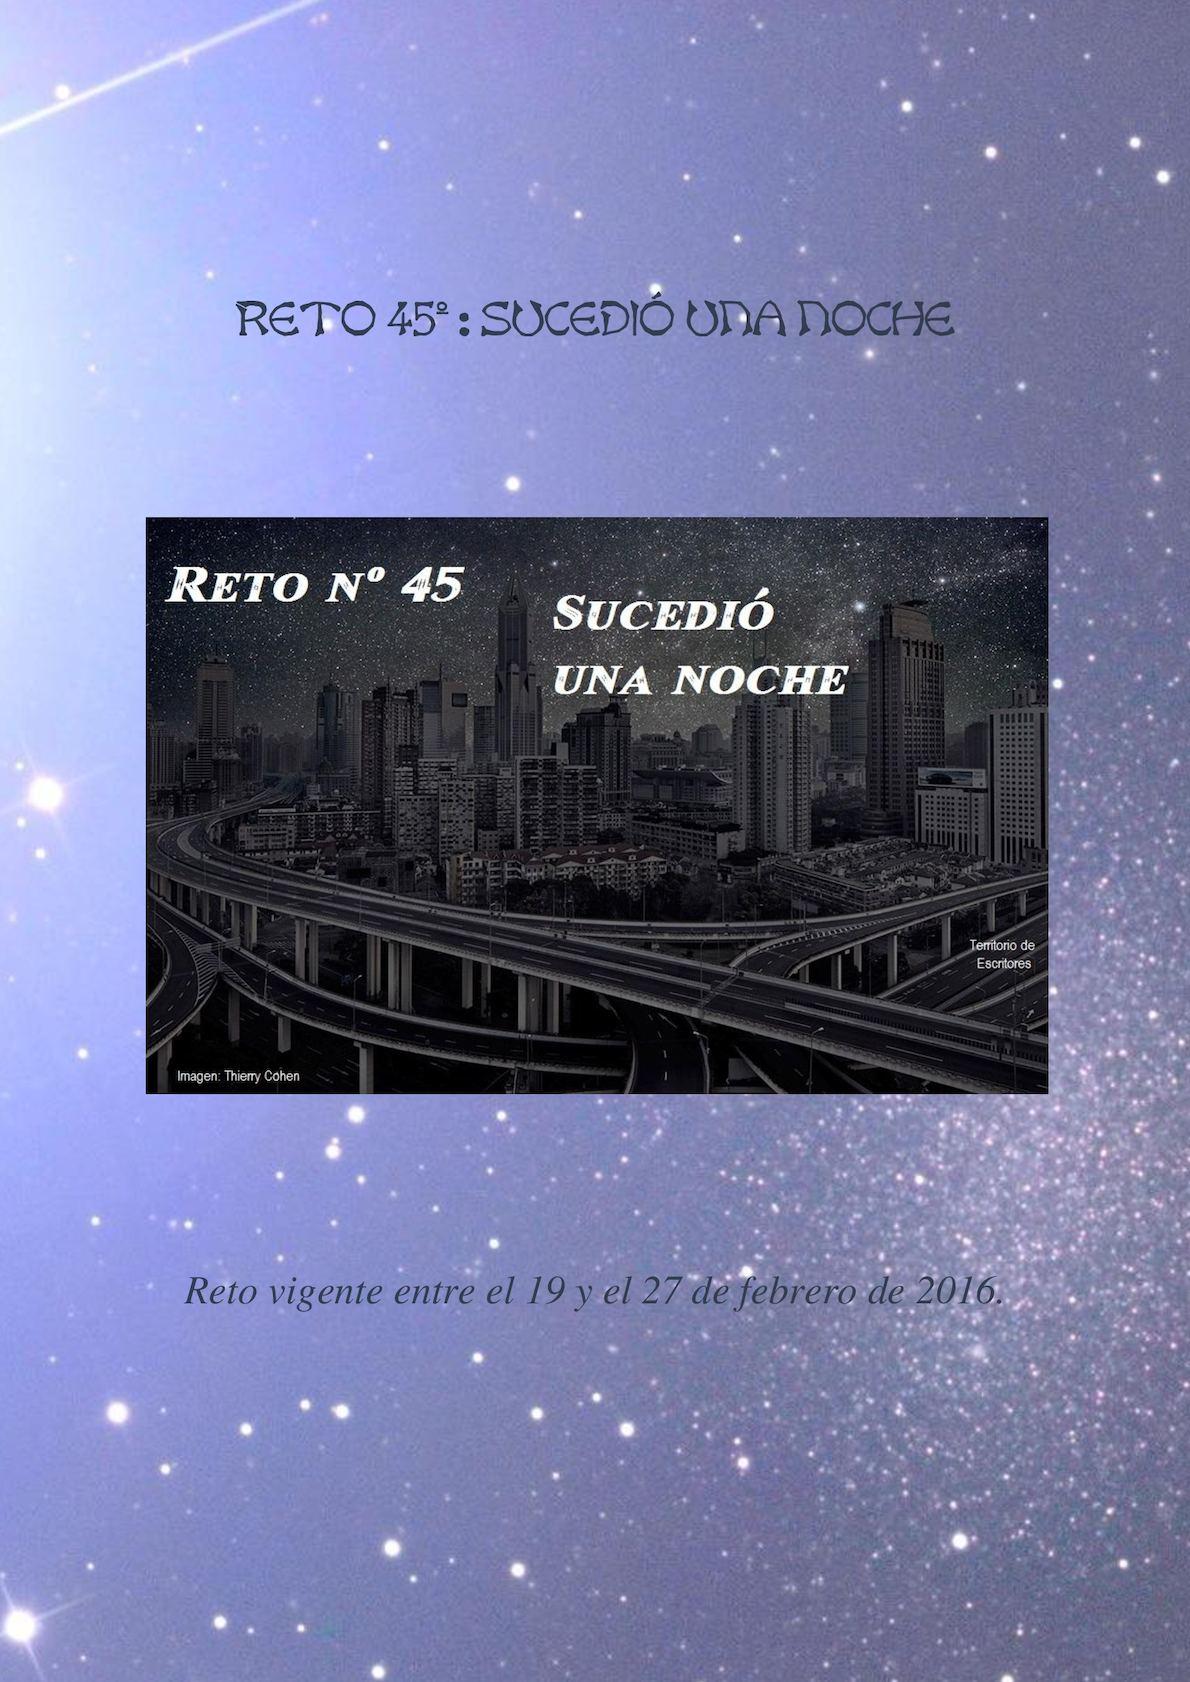 Calaméo - Reto Nº 45 Suecdió Una Noche